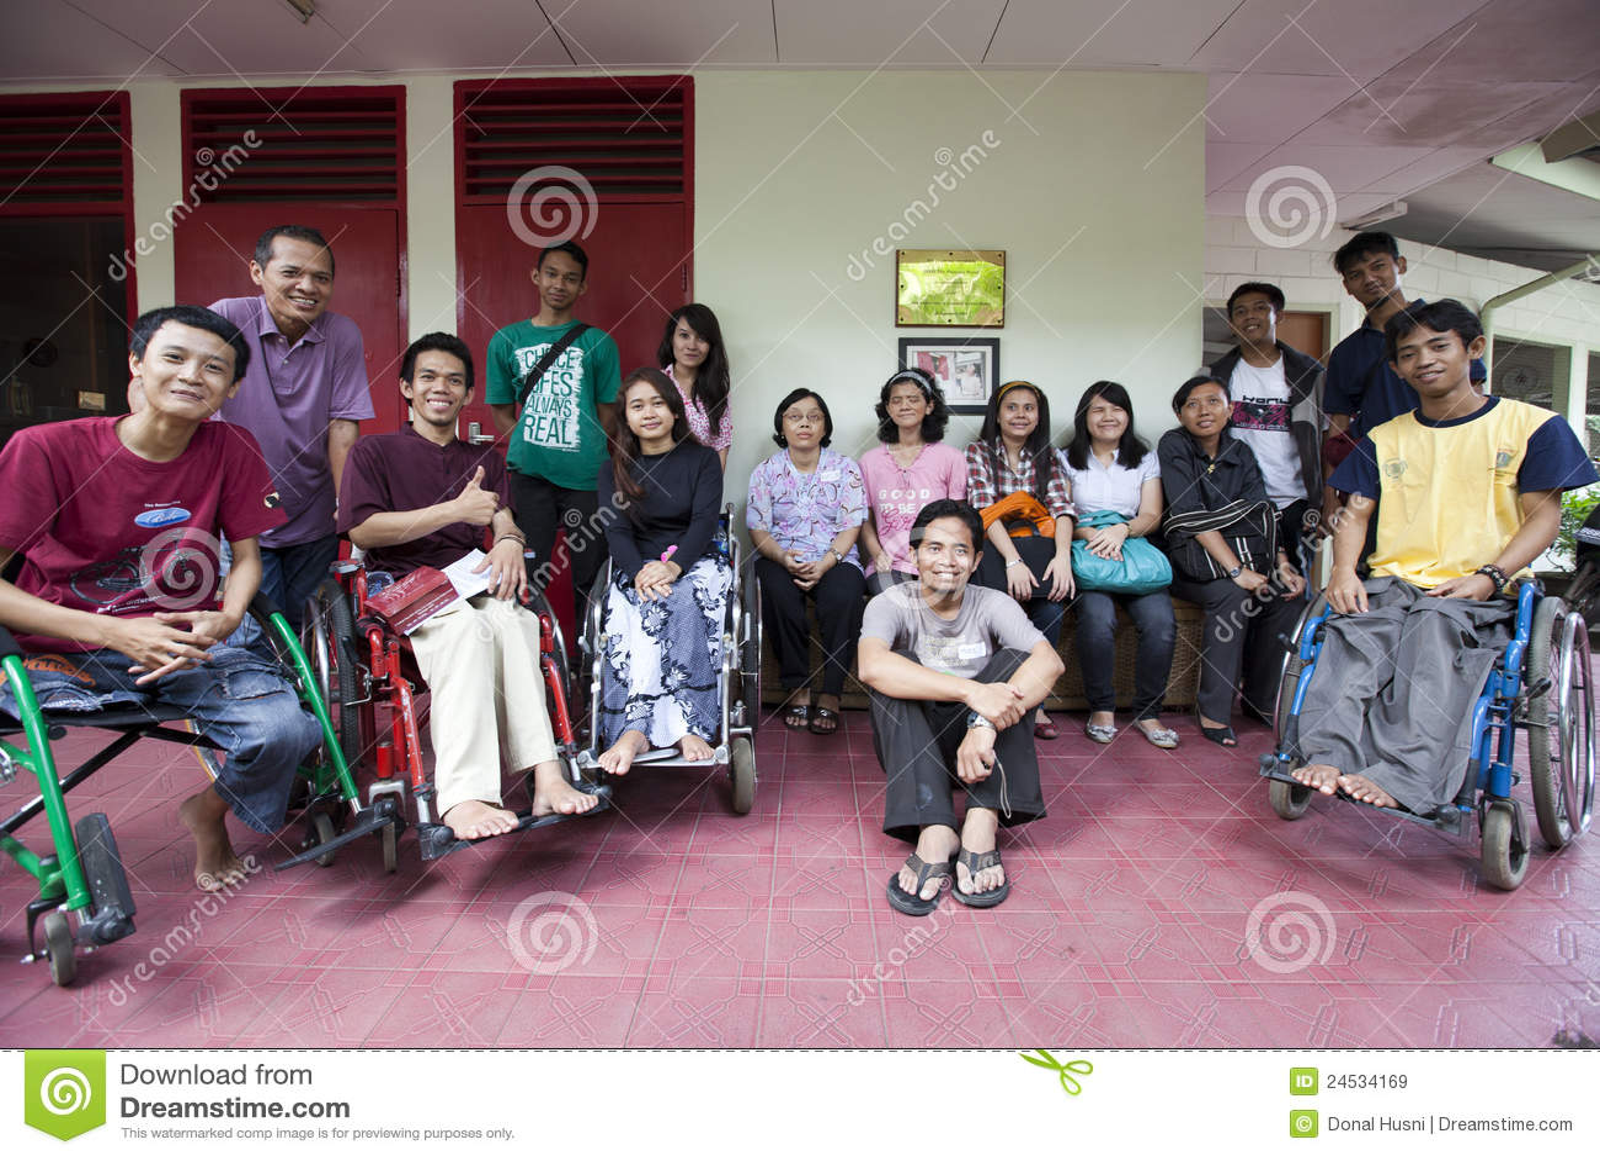 YO! Youth Organizing – Disabled & Proud